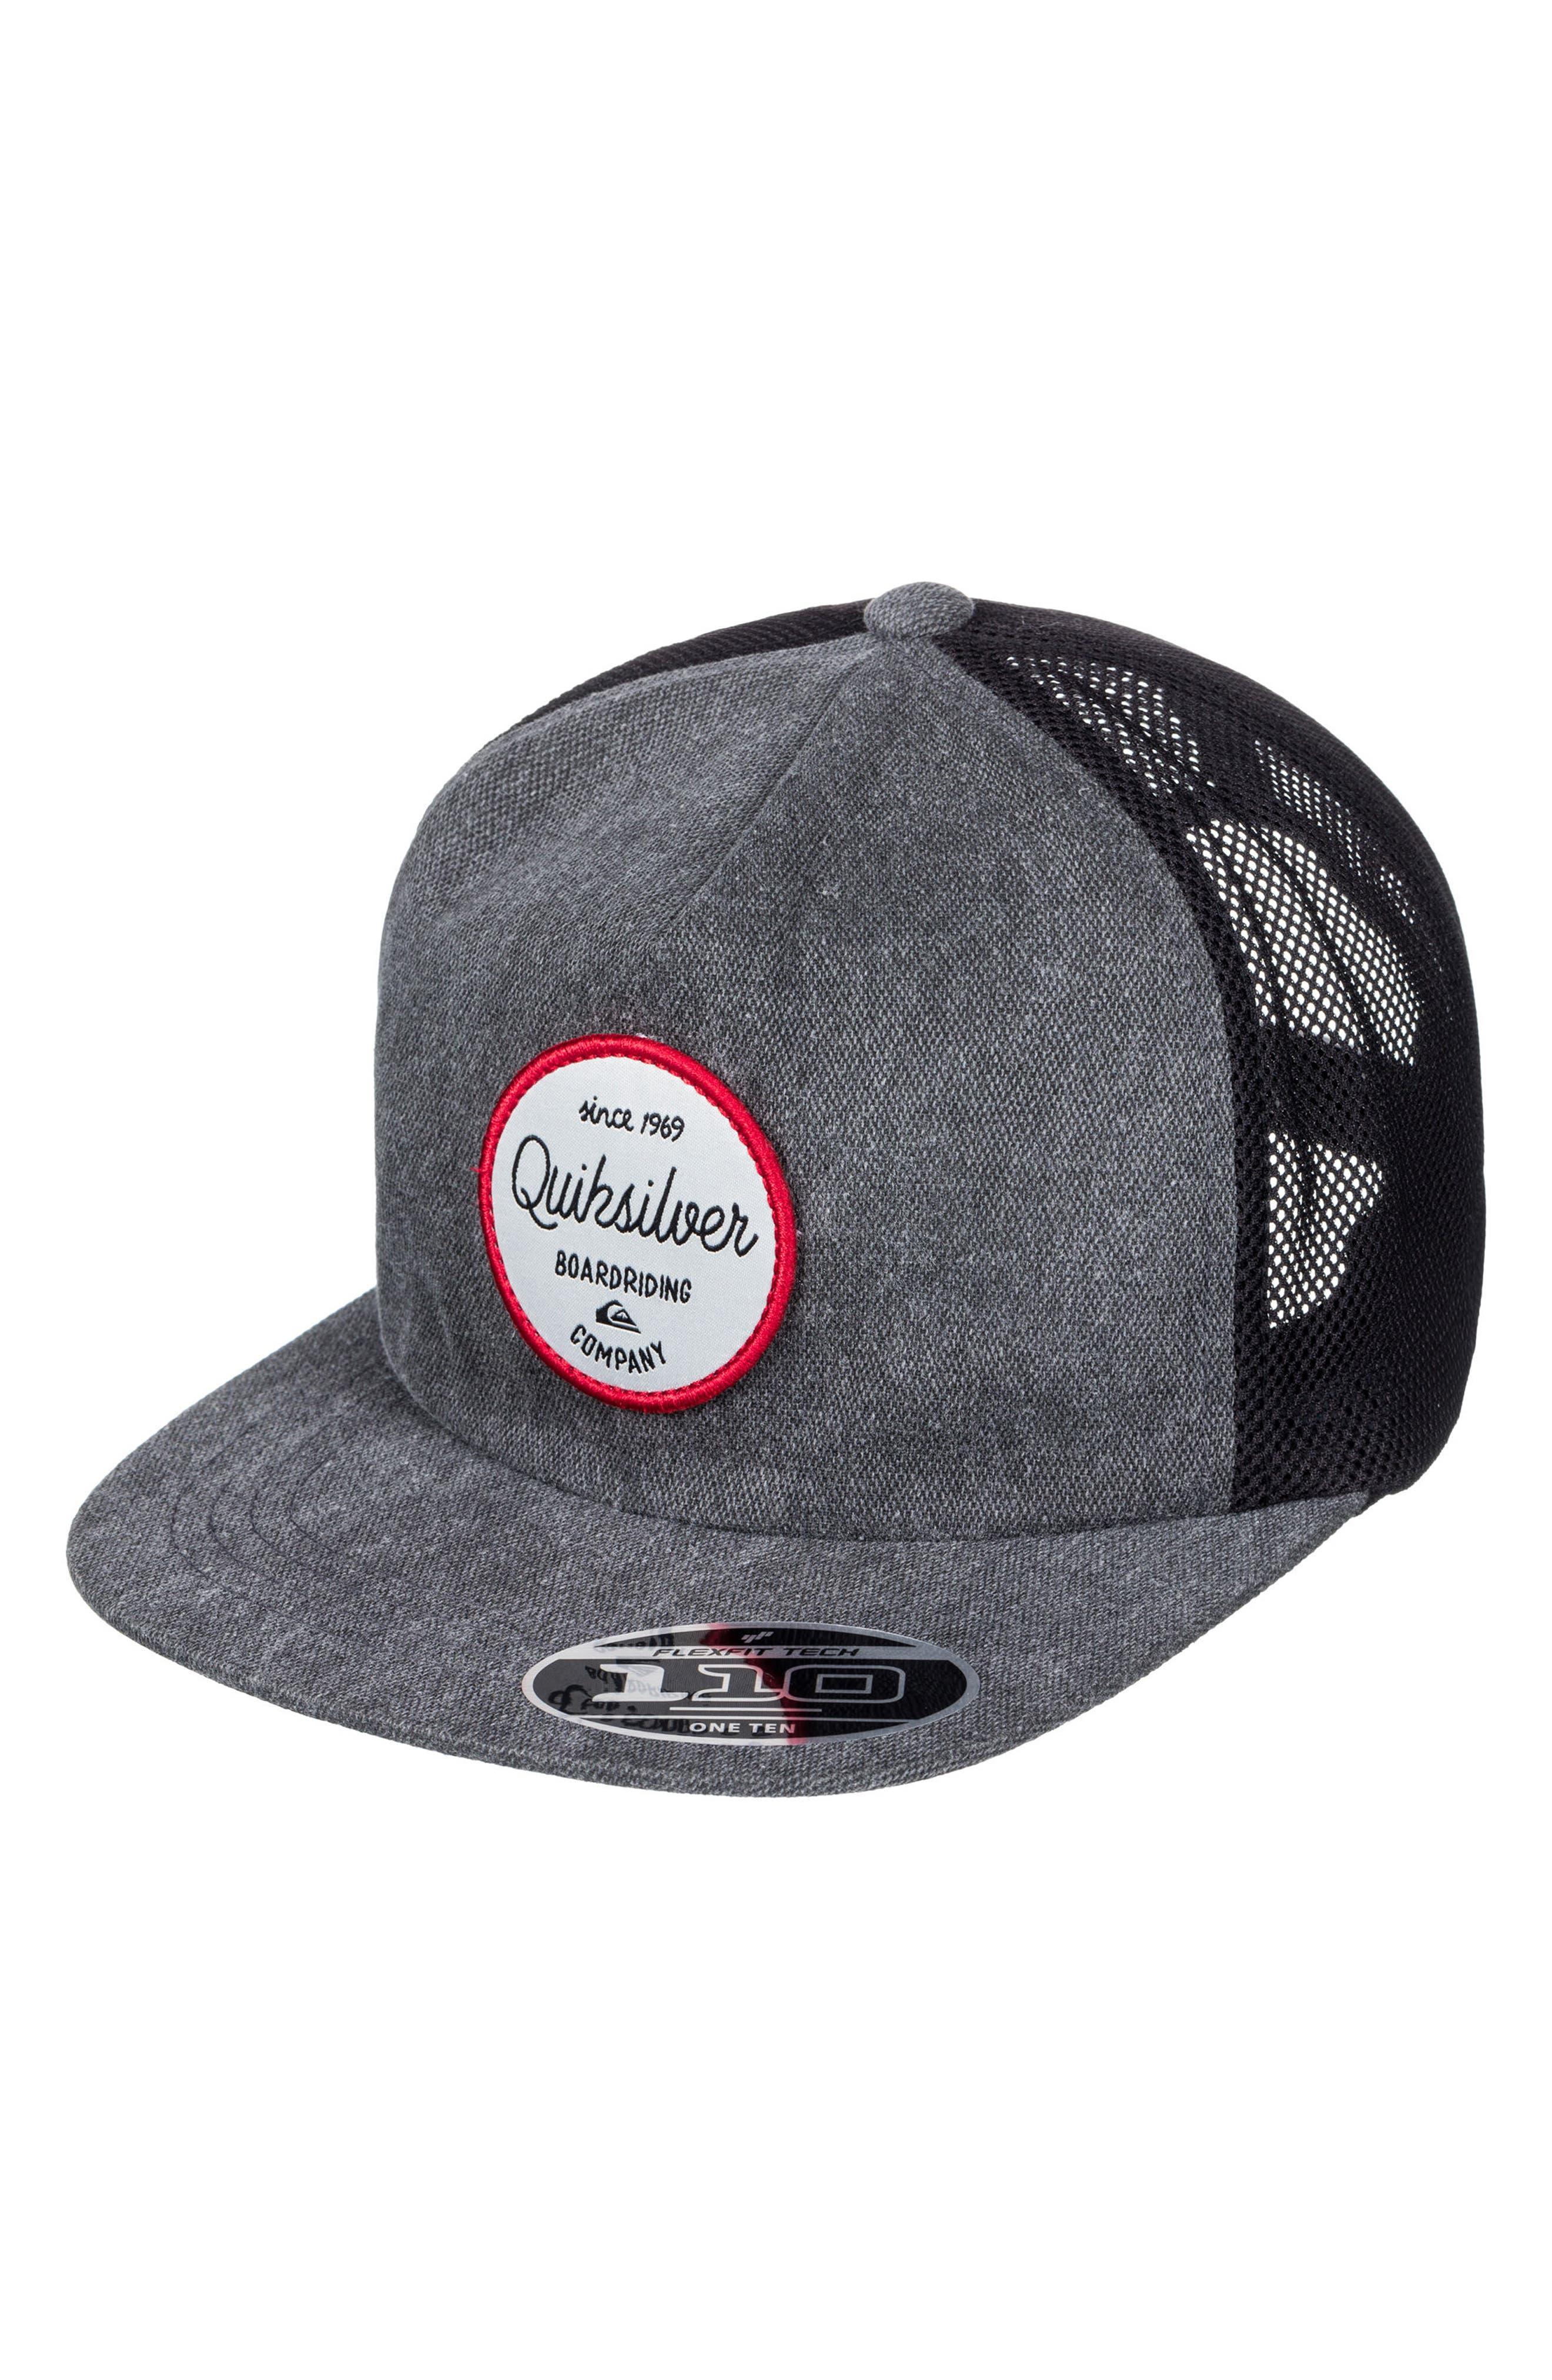 Sloucher Trucker Hat,                         Main,                         color, 002